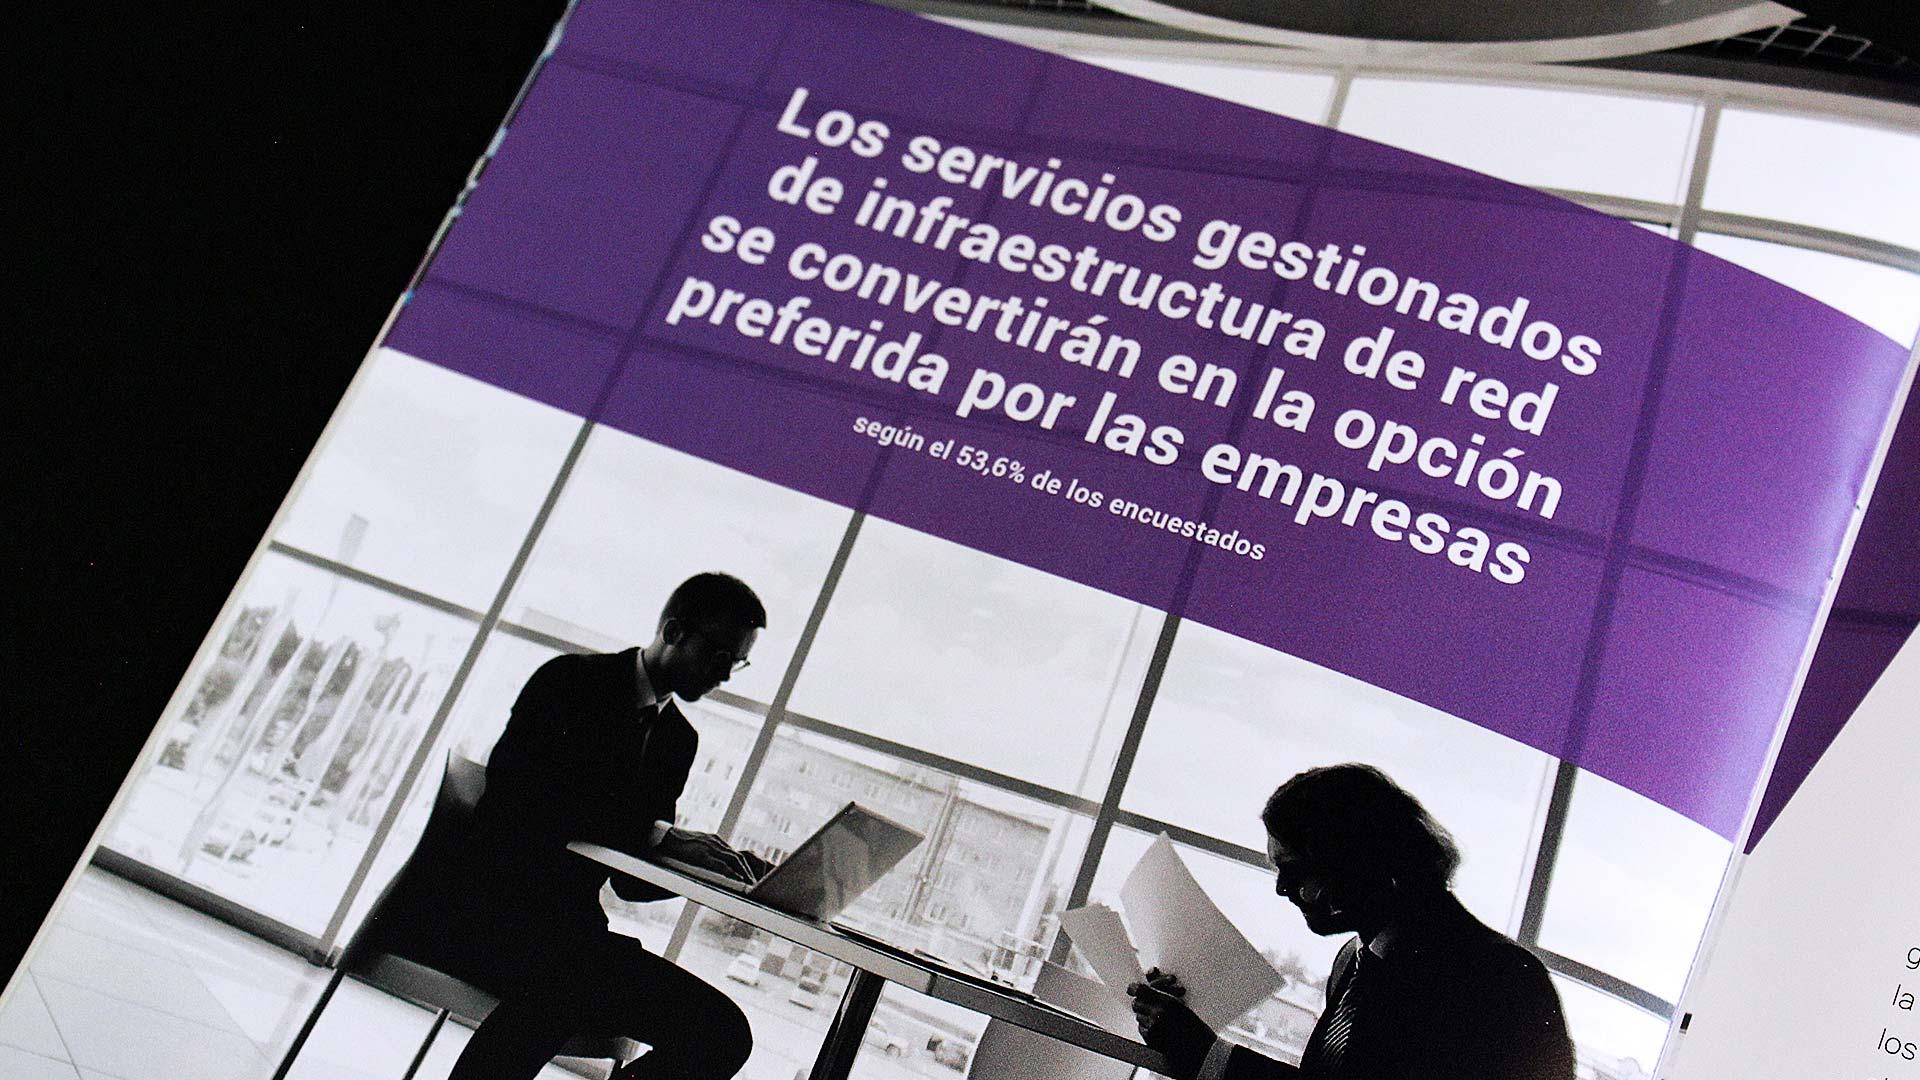 alcatel-content-marketing-informe-resumen-ejecutivo-networkondemand-ebook-2016-19